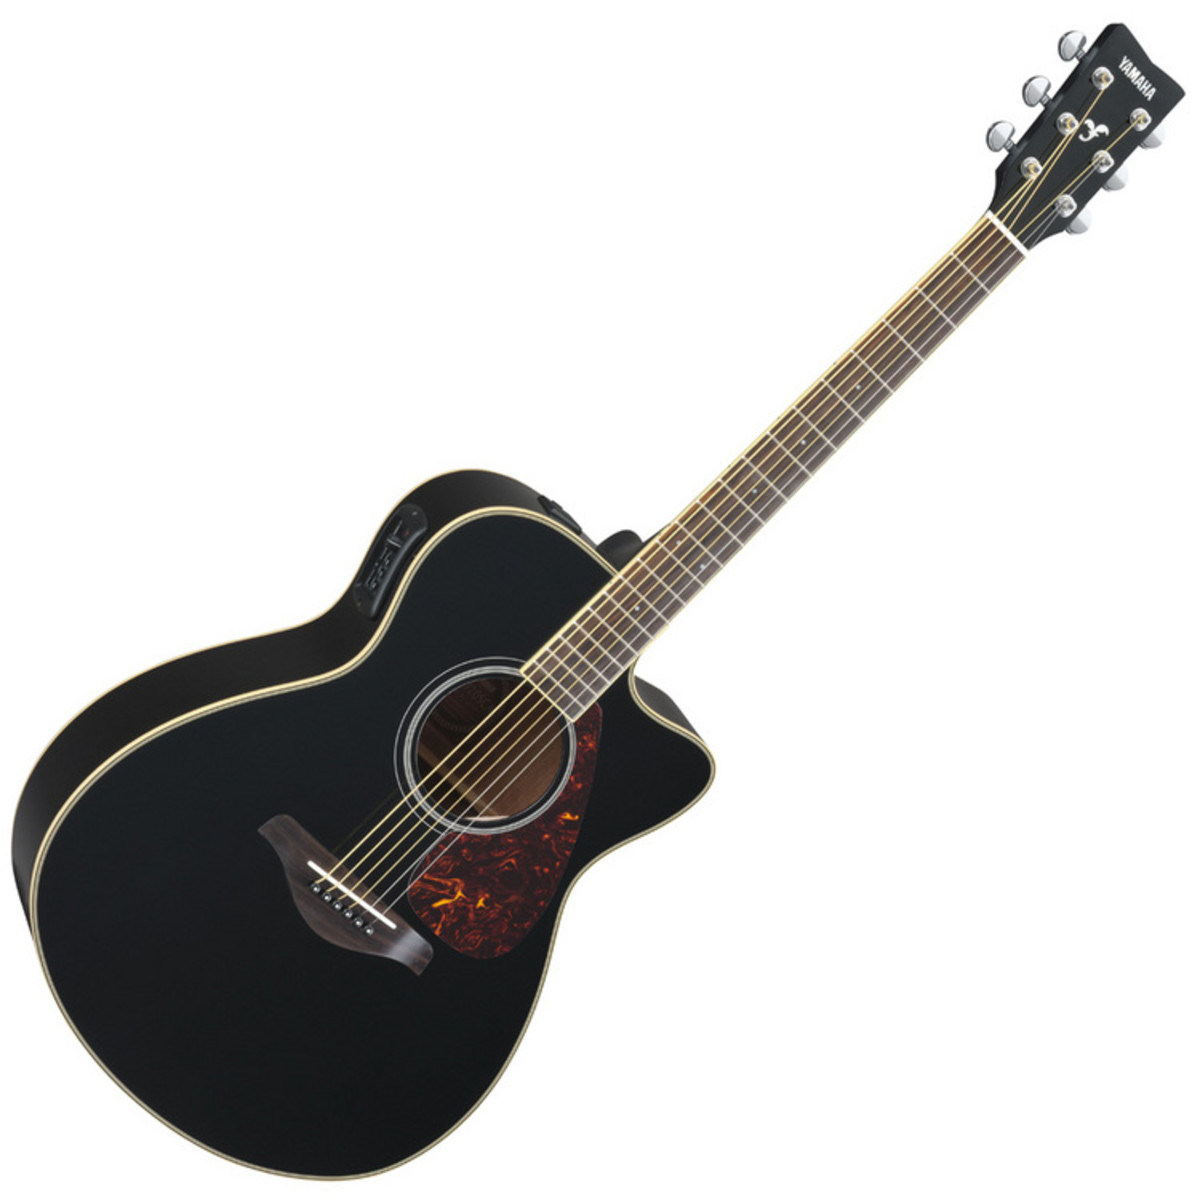 yamaha fsx720s elektro akustik gitarre schwarz auf. Black Bedroom Furniture Sets. Home Design Ideas